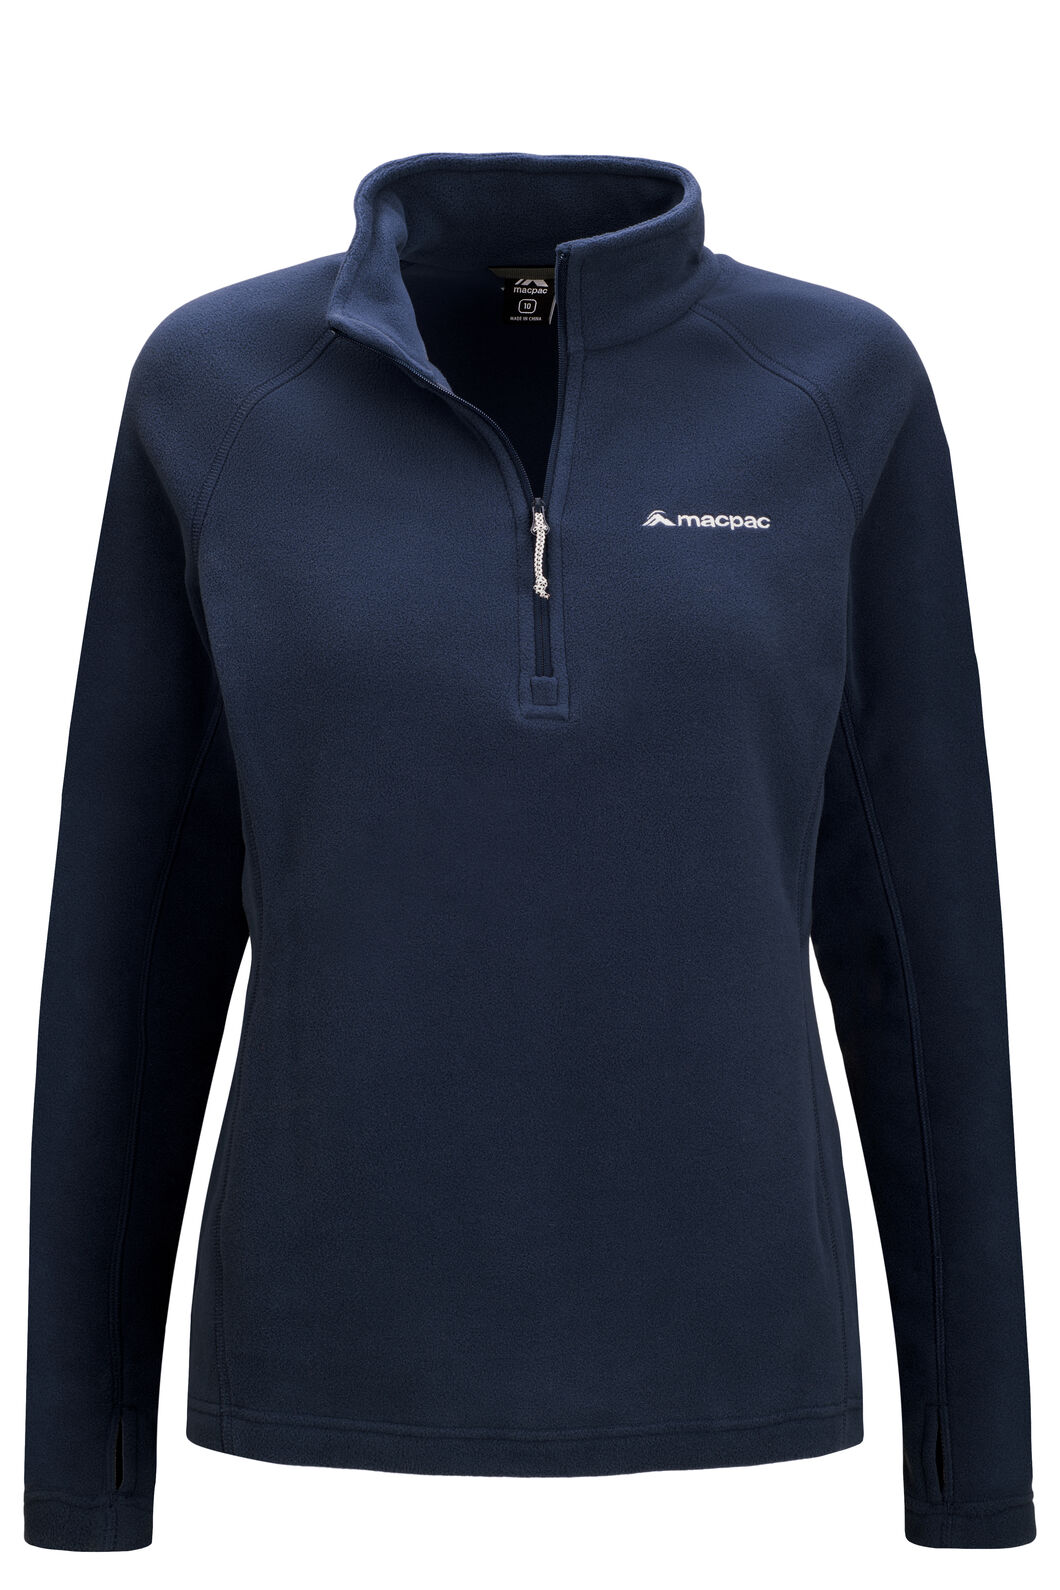 Macpac Women's Tui Polartec® Micro Fleece® Pullover, Black Iris, hi-res